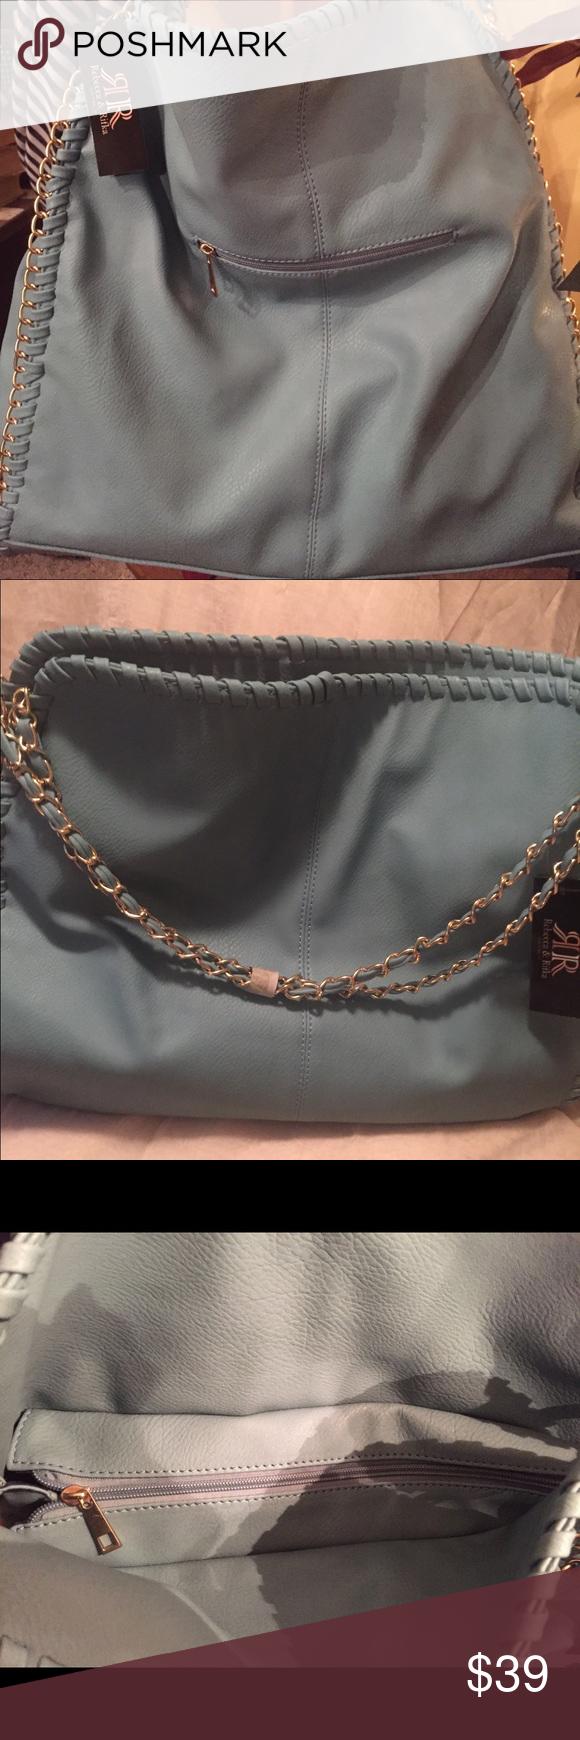 NWT- Rebecca&Rifka FauxLeather Large HB blue/green NWT- Rebecca&Rifka Faux Leather Large Tote Handbag Light blue/green gold chain rebecca&rifka Bags Totes